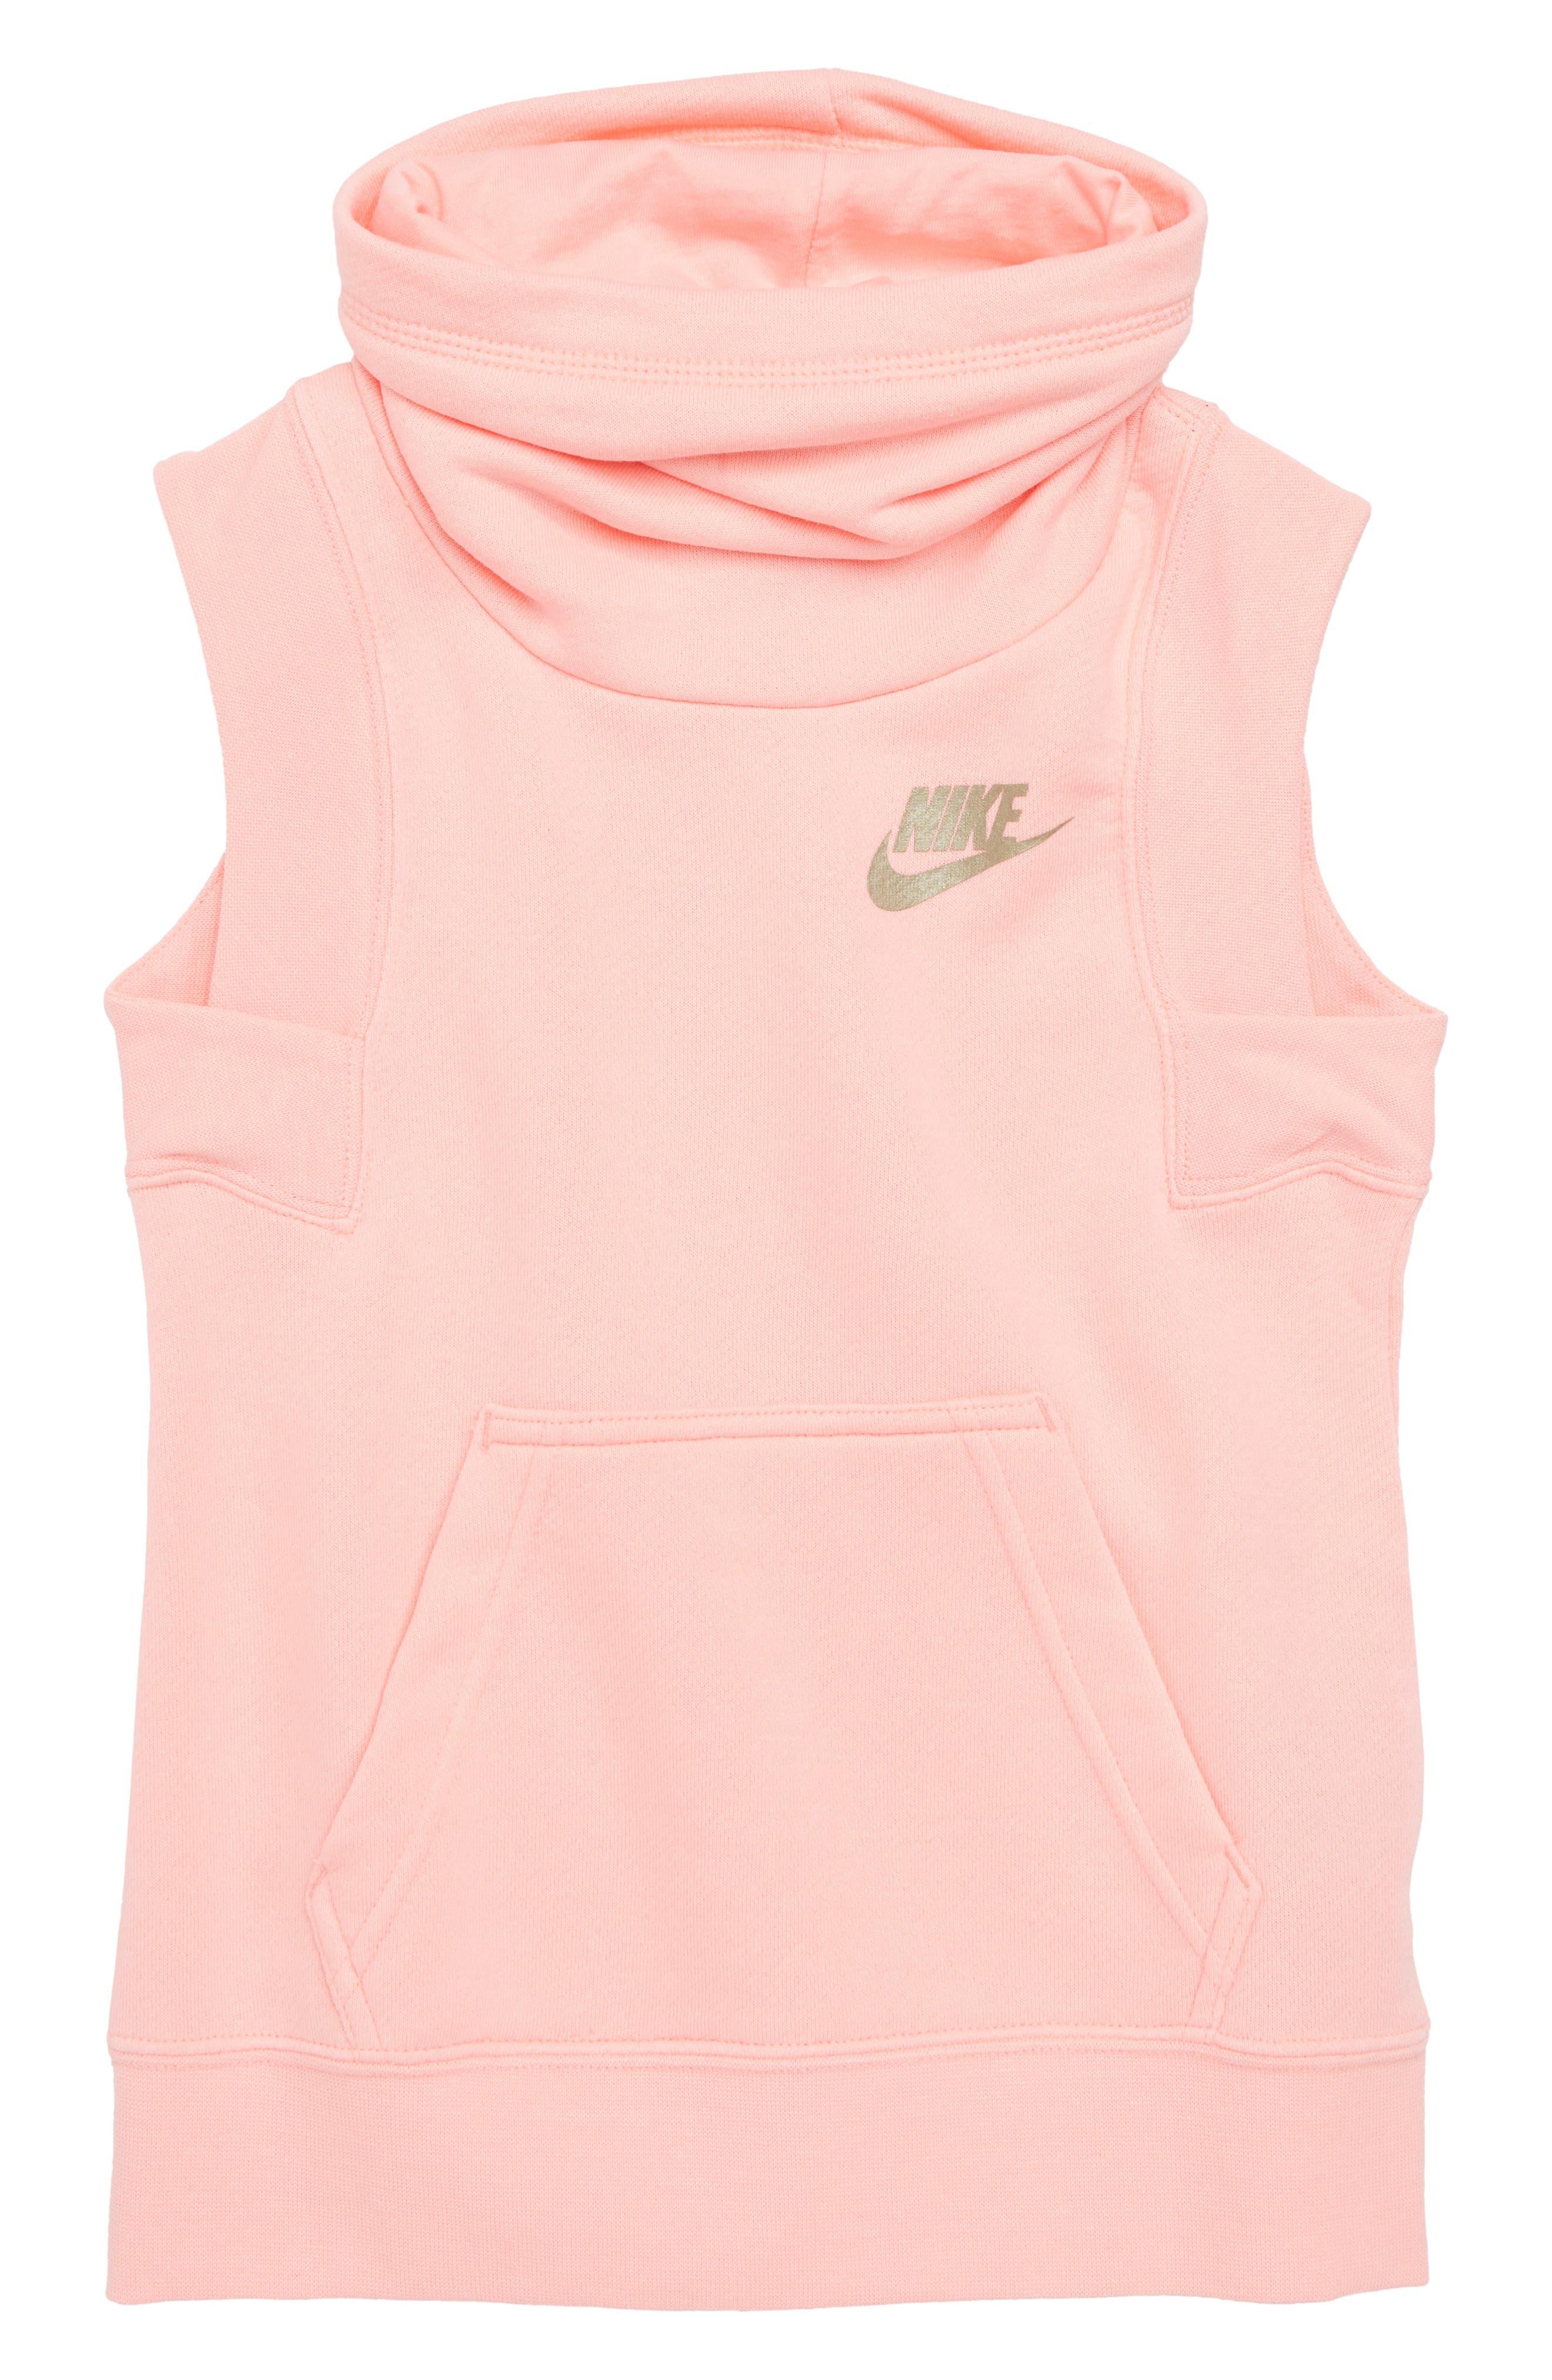 Nike Sleeveless Funnel Top (Big Girls)